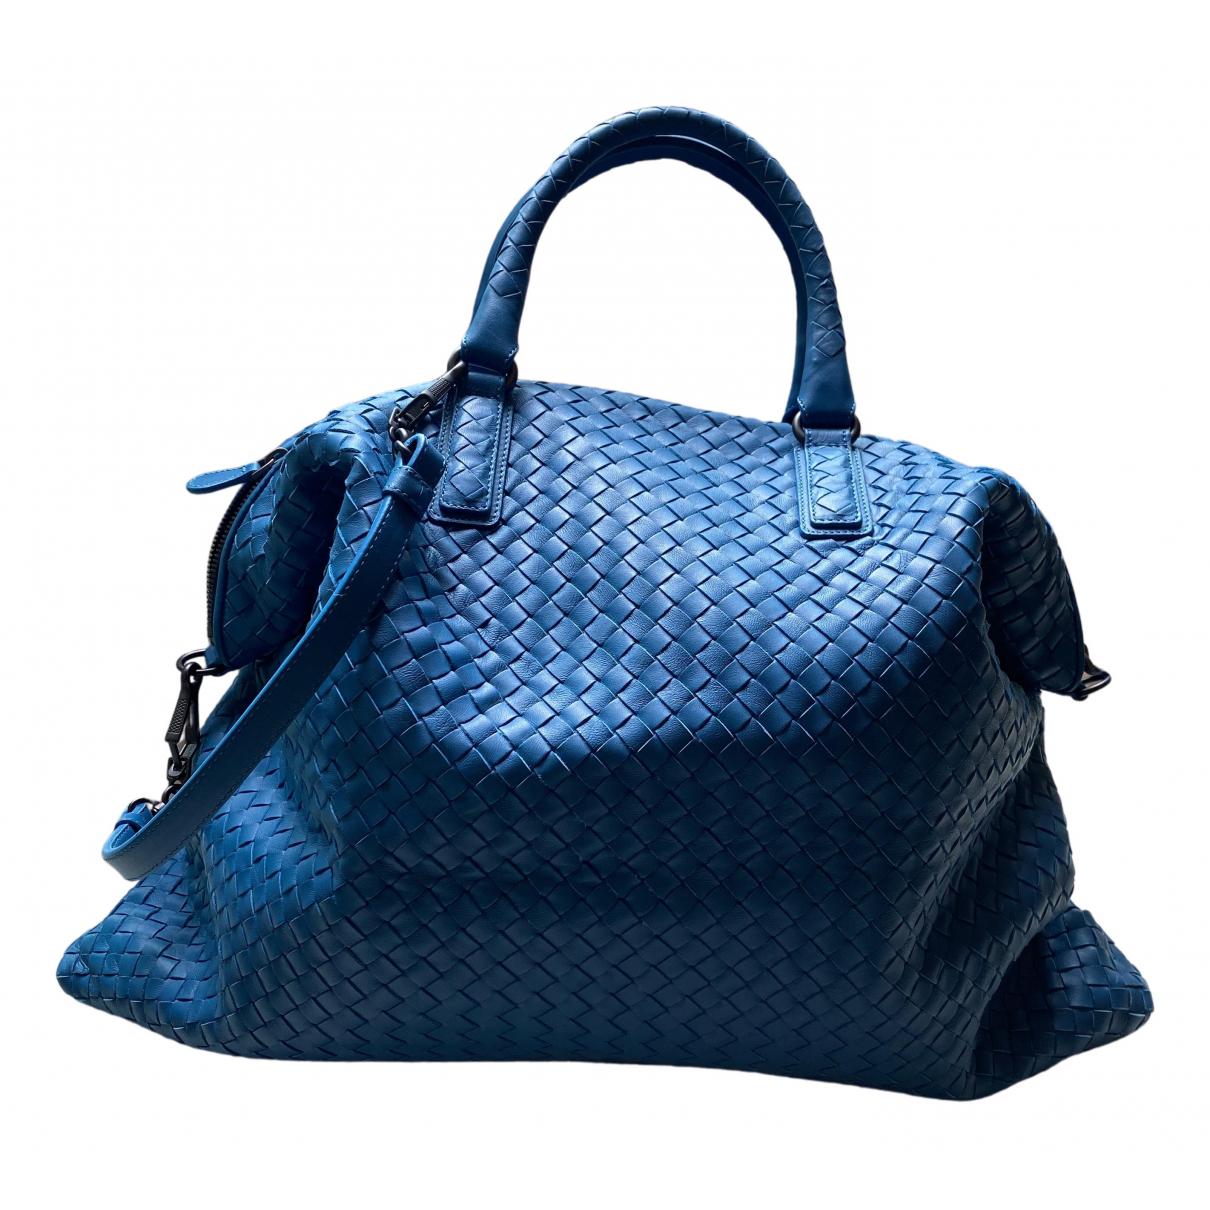 Bottega Veneta \N Reisetasche in  Blau Leder